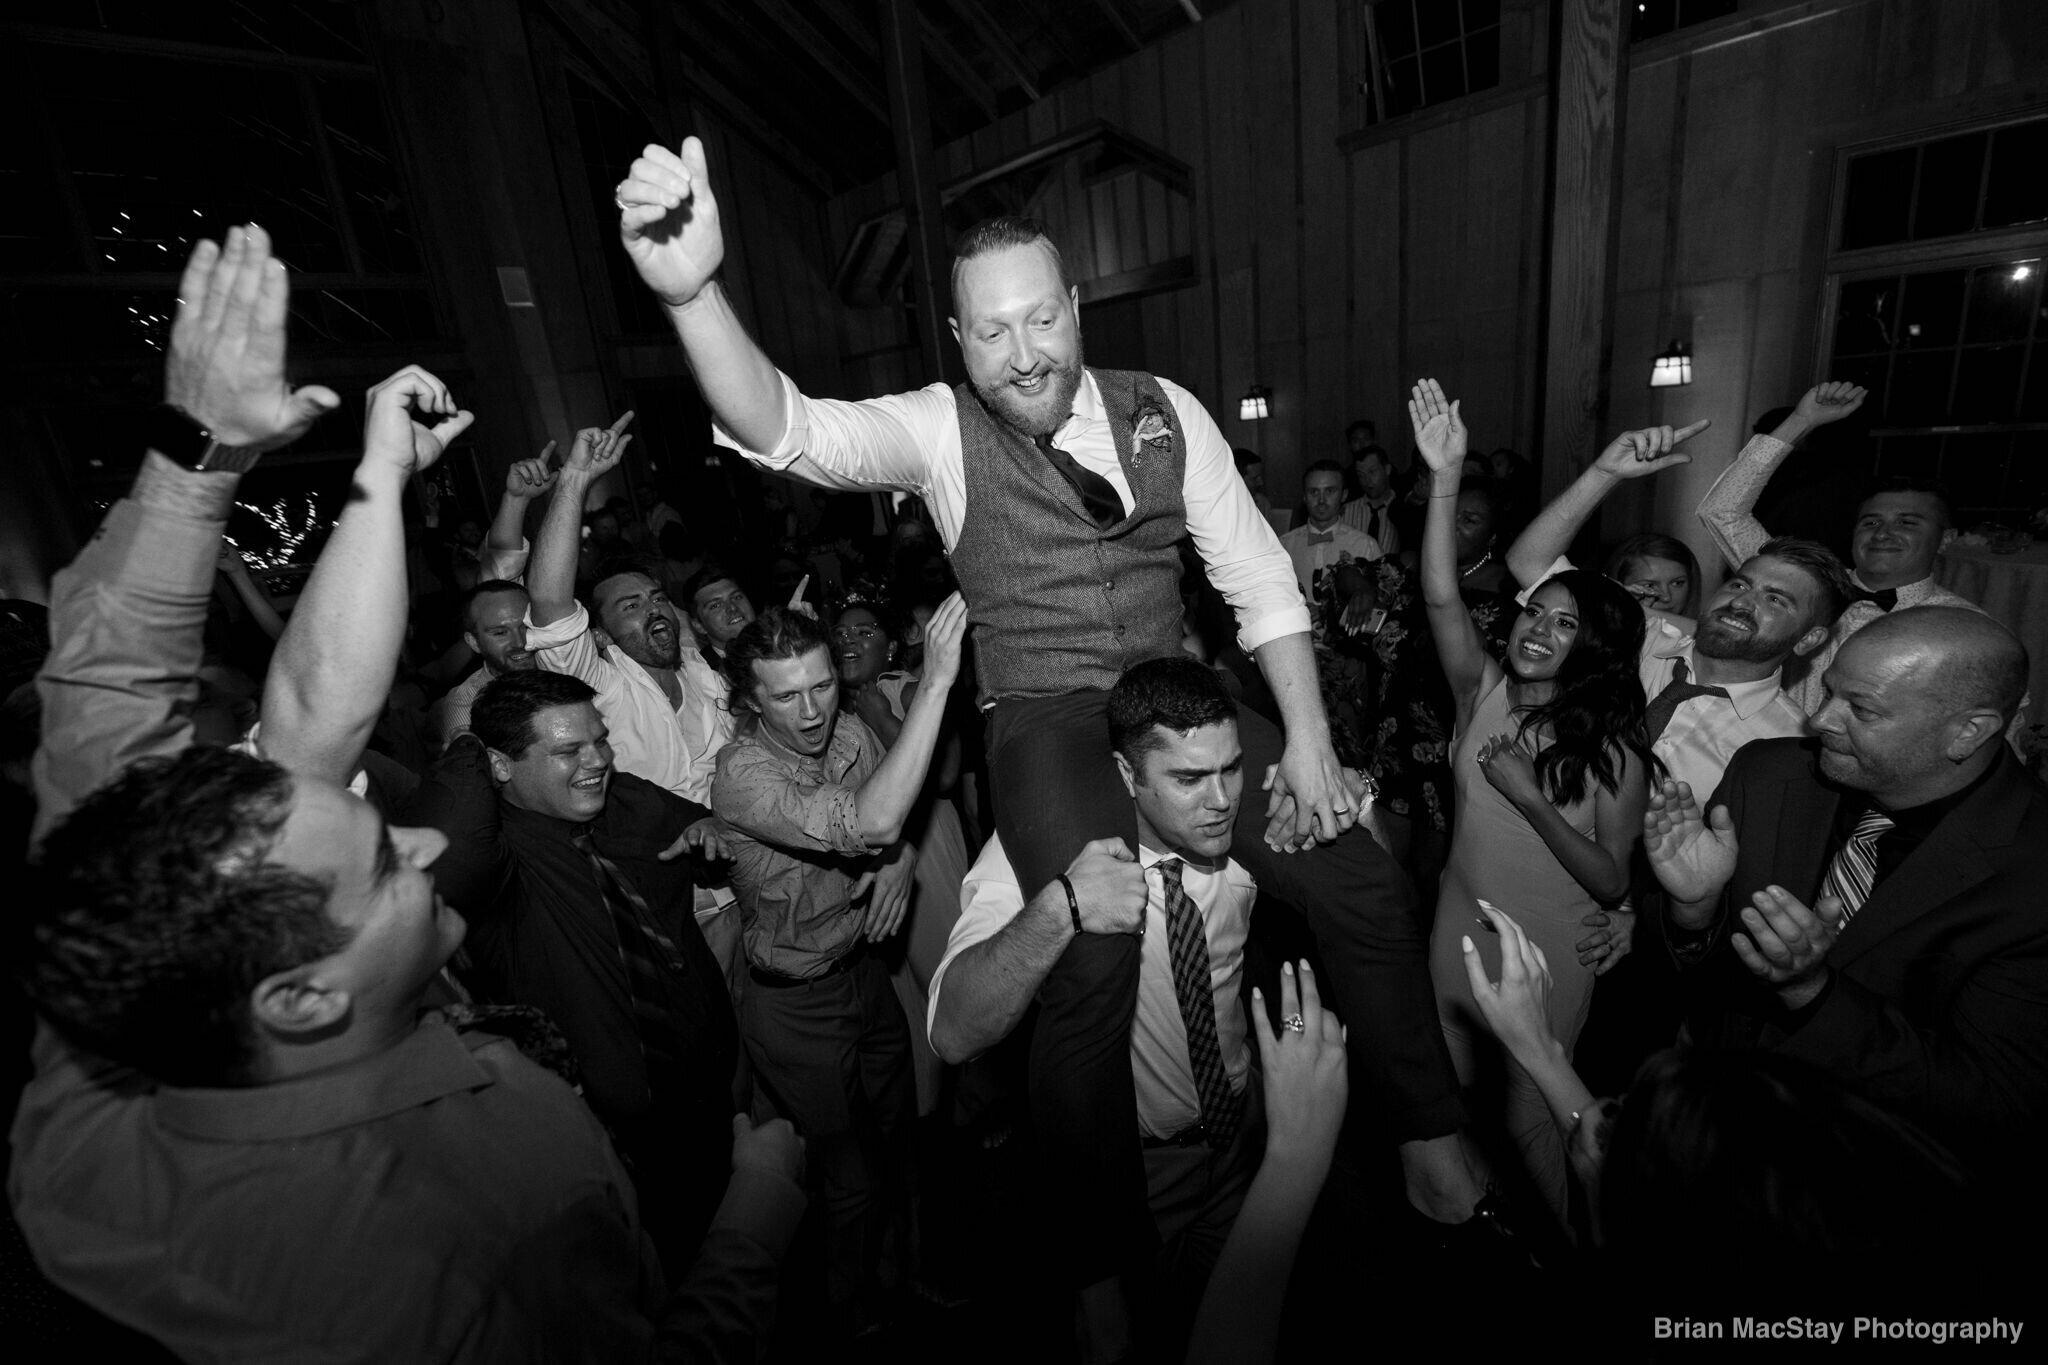 Demi & Josh Dancing Photo 2 - Brian MacStay Photography.jpeg